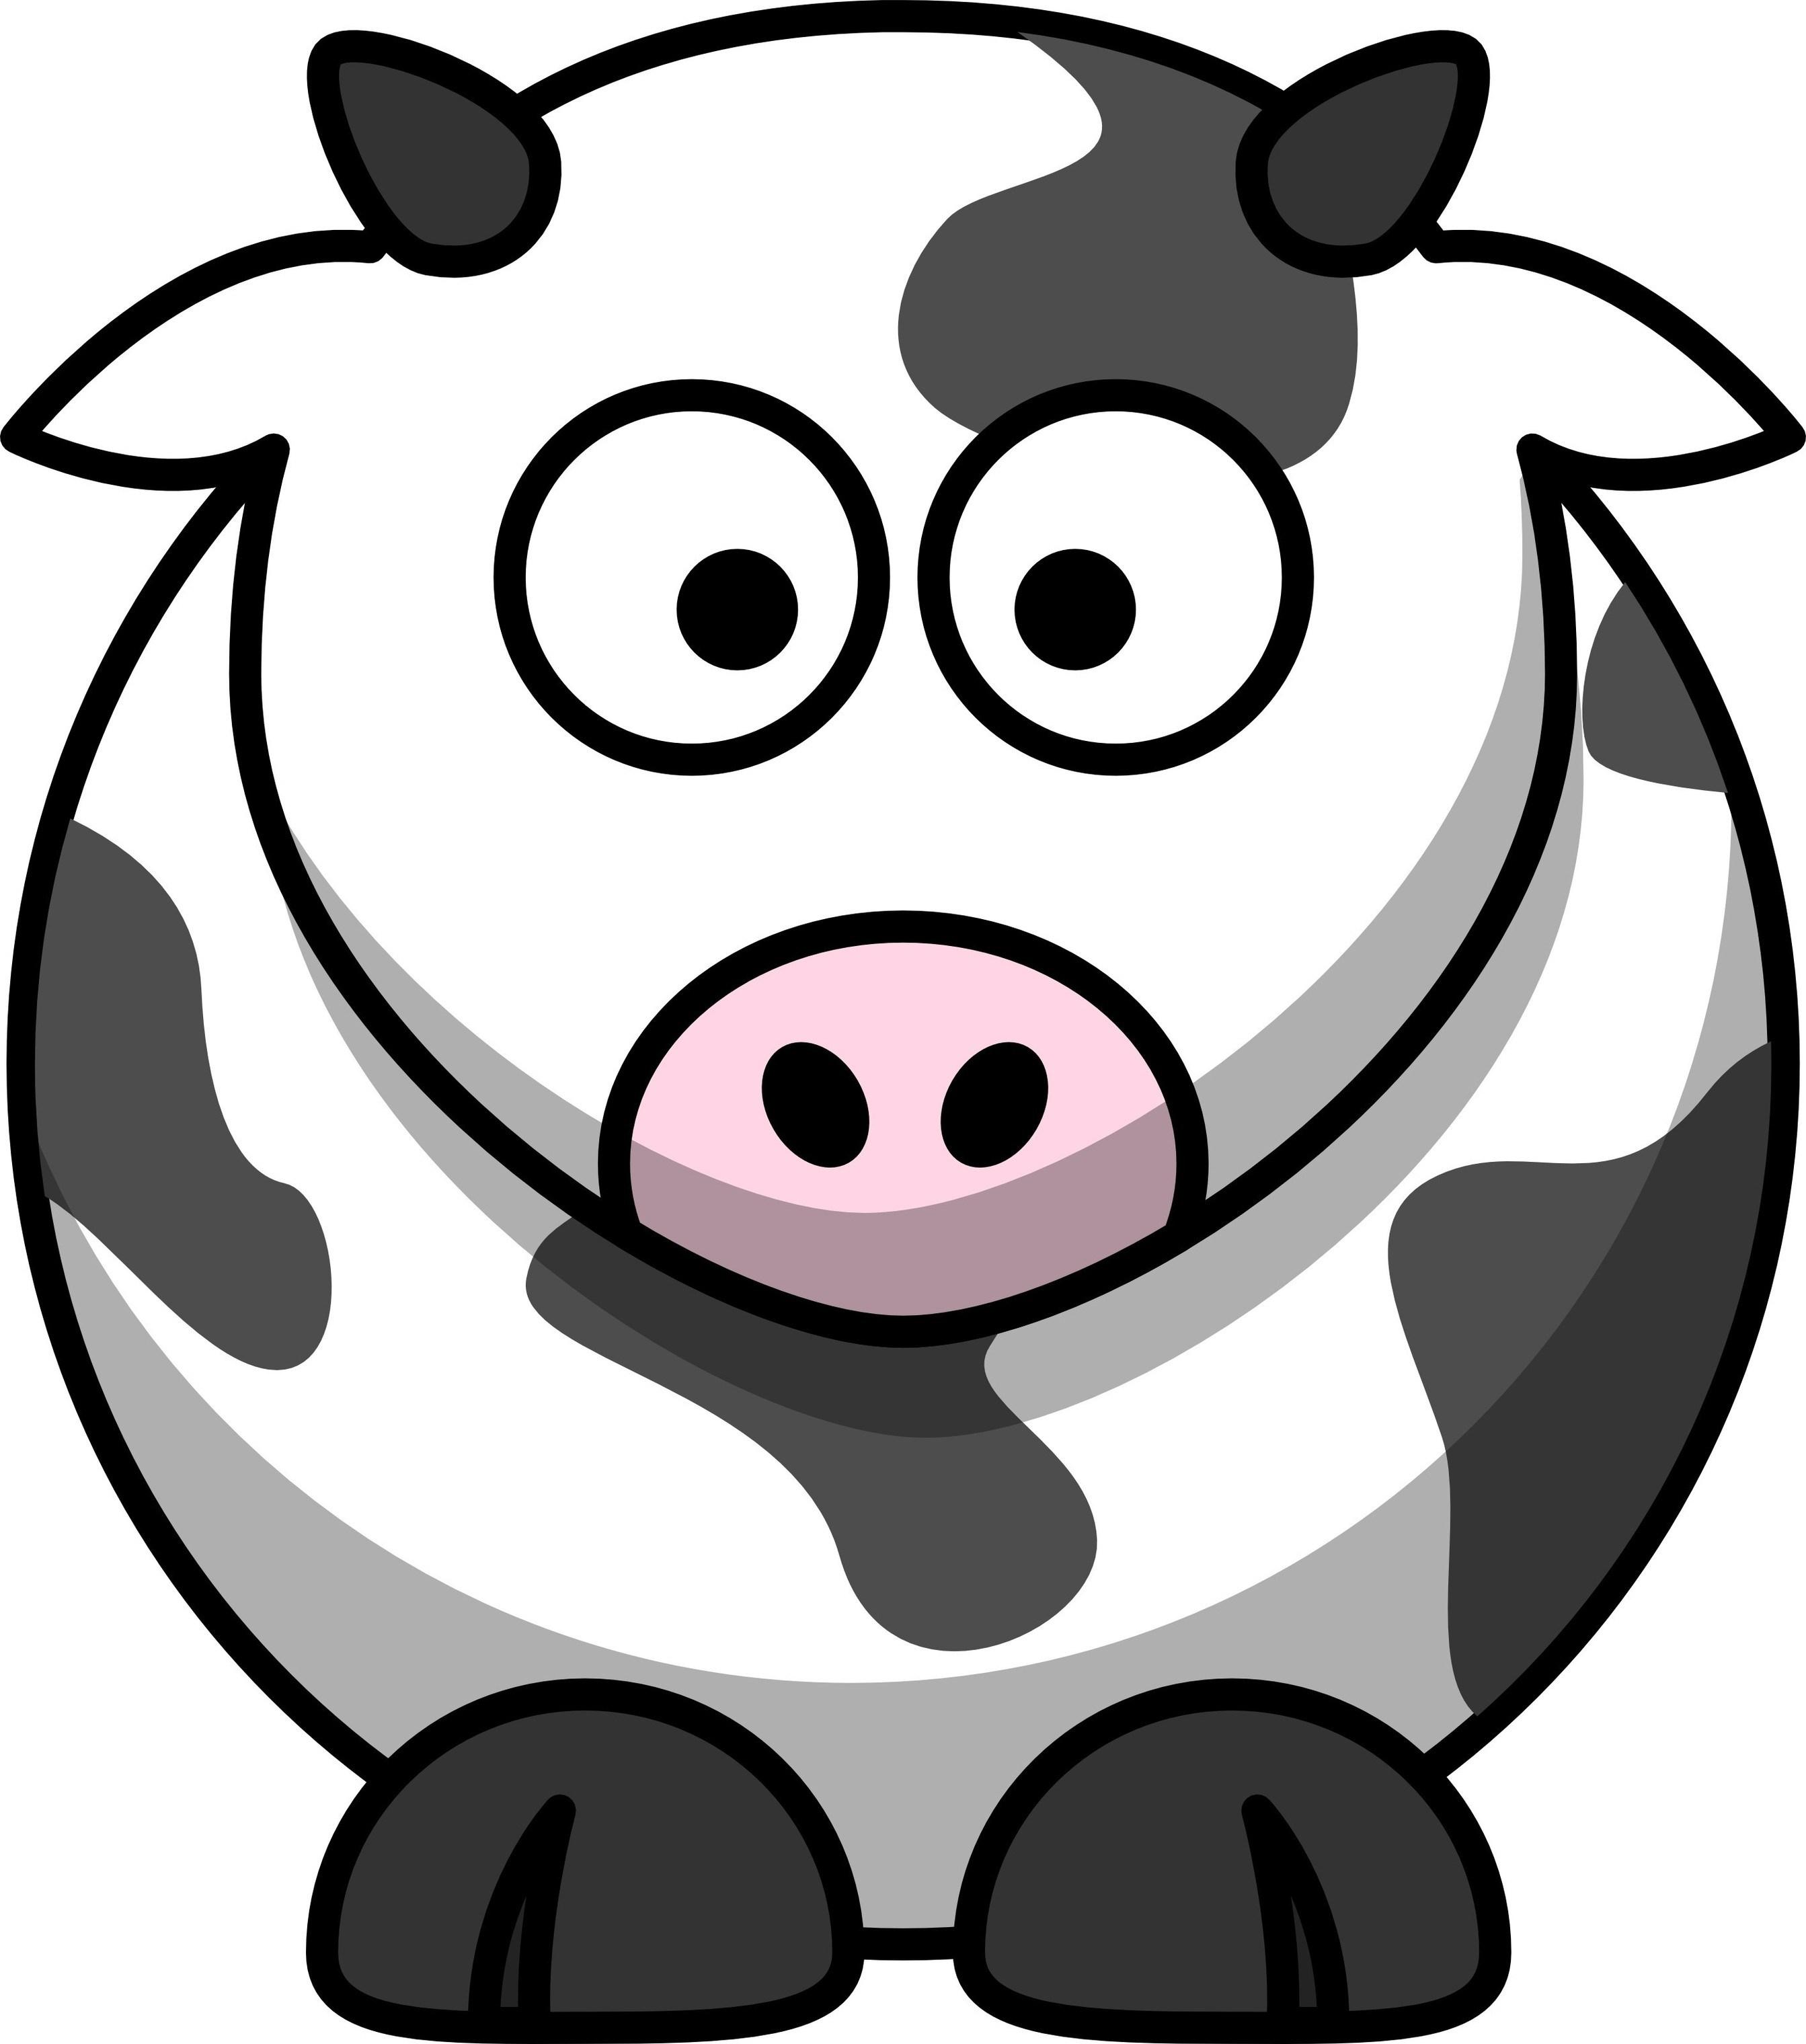 Animated farm animals clipart 4 » Clipart Portal.